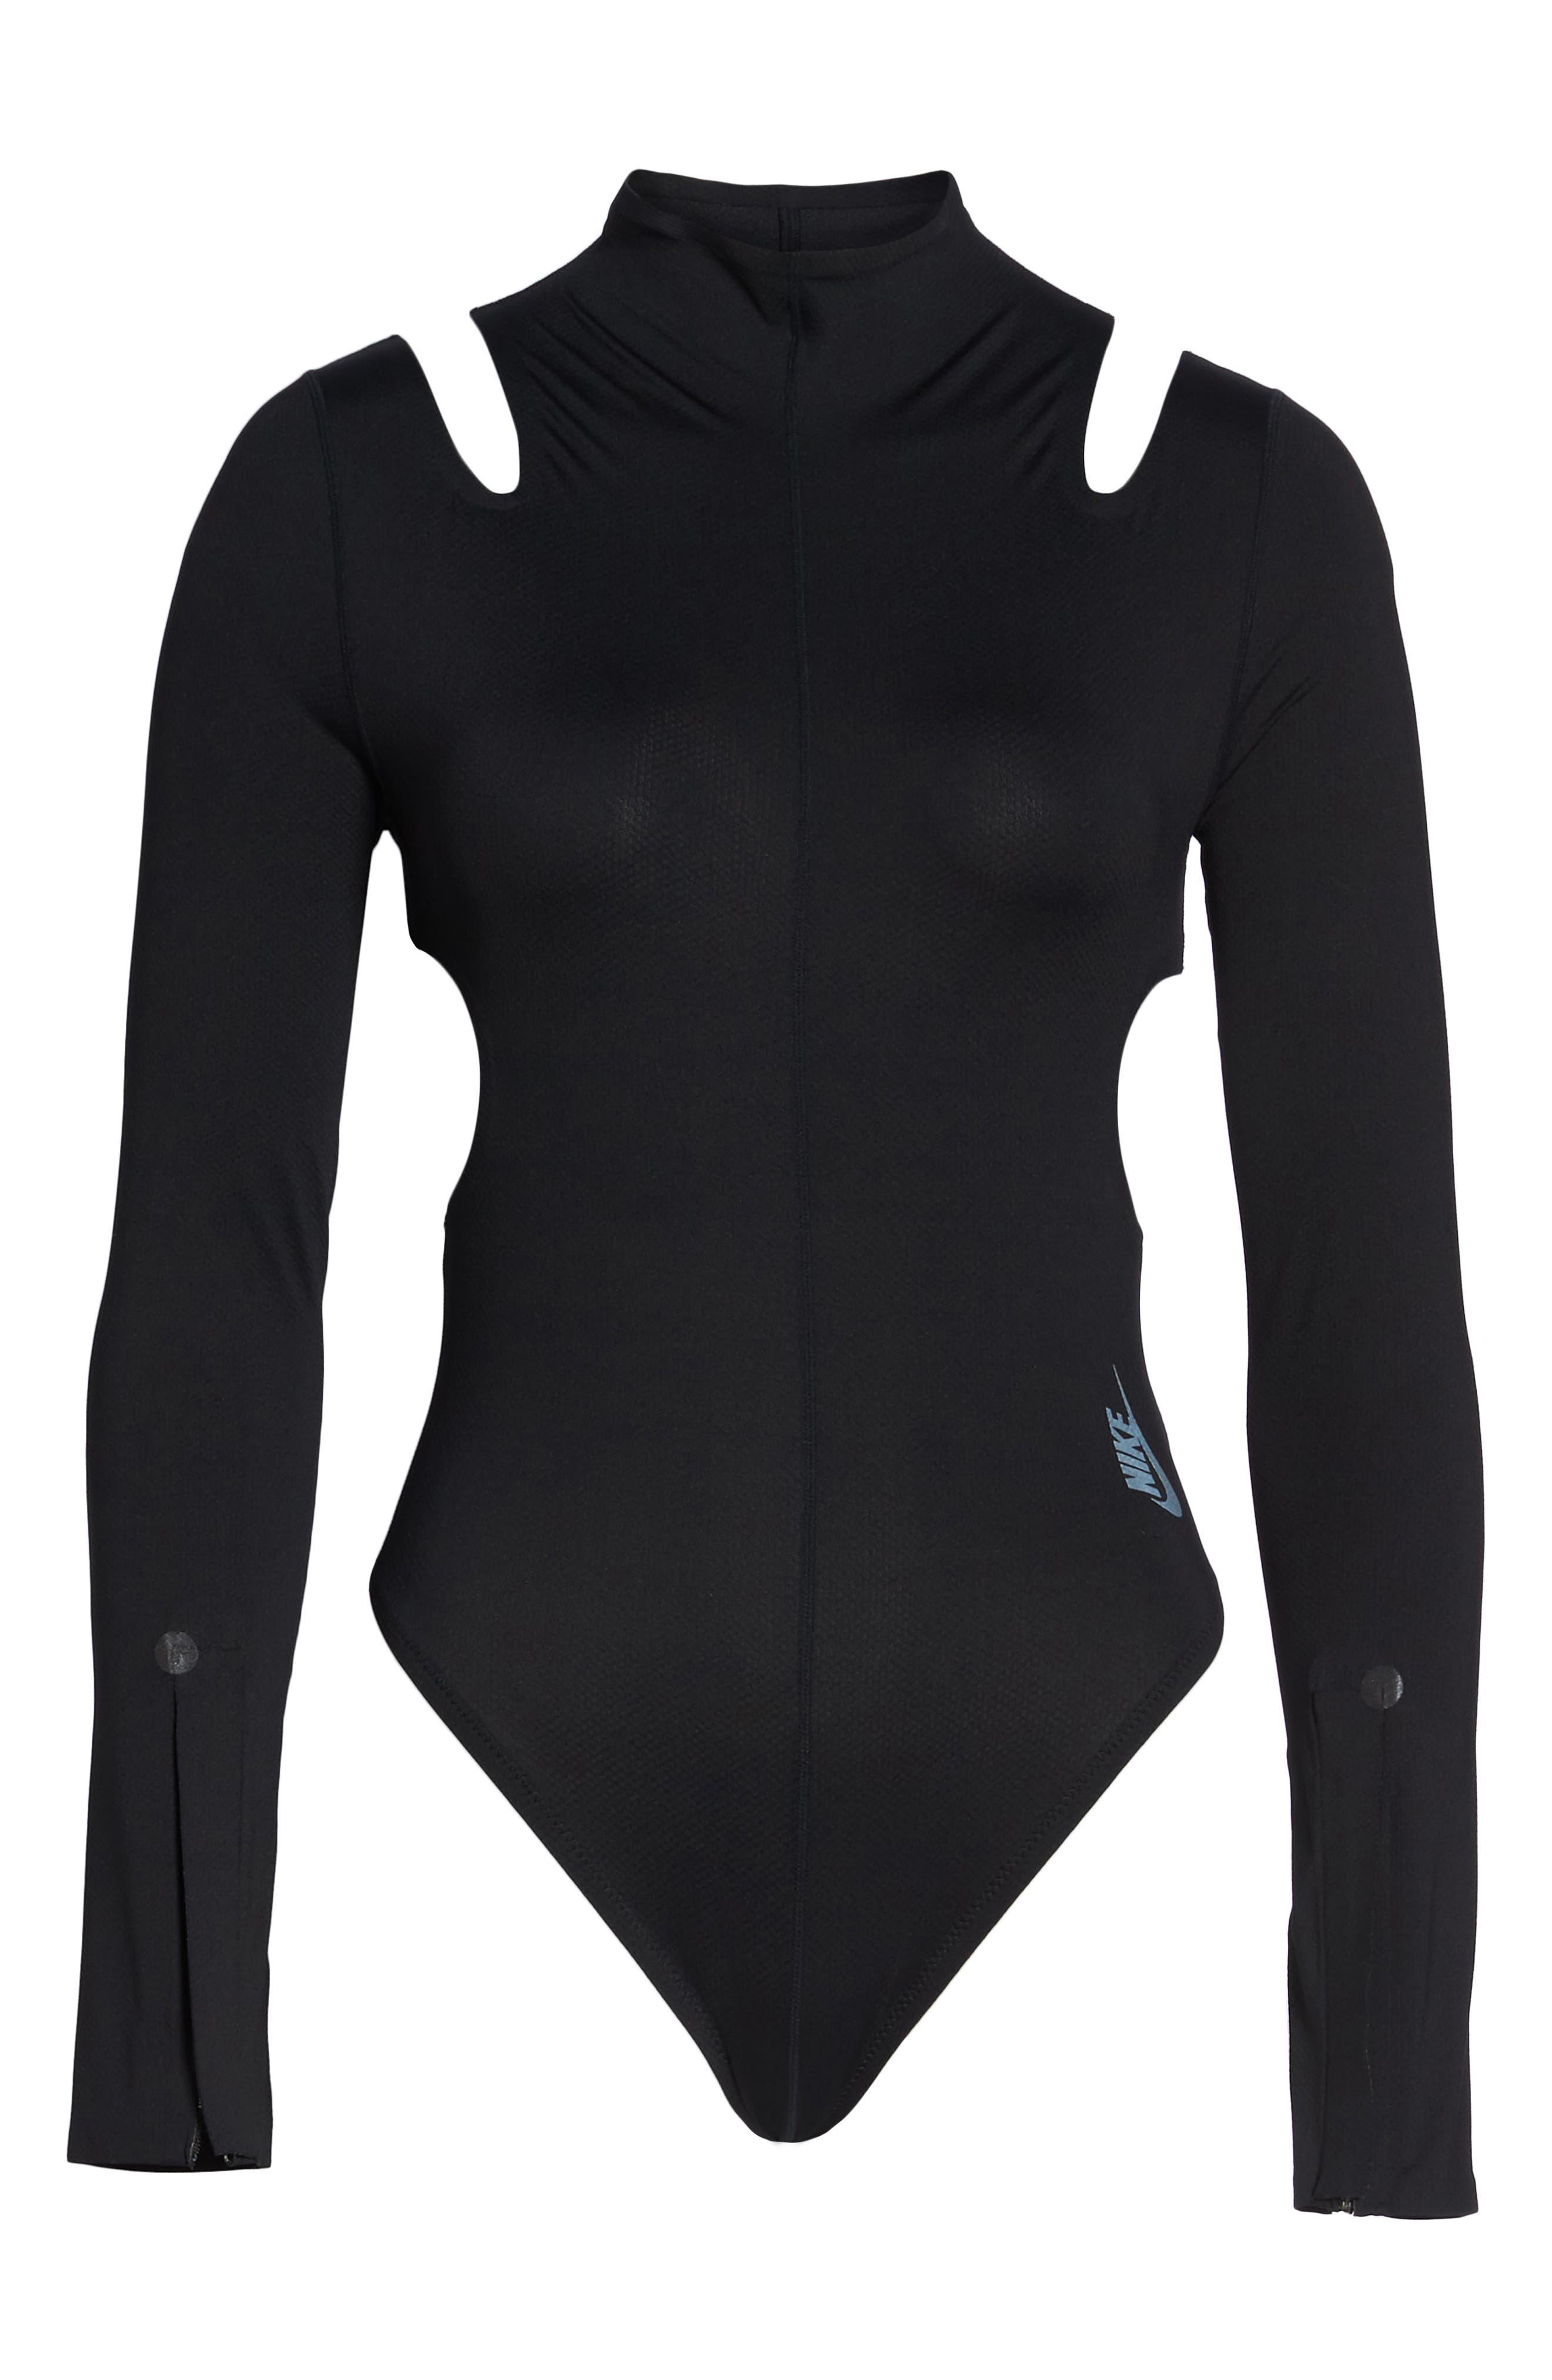 NikeLab XX Women's Dri-FIT Training Bodysuit,                             Alternate thumbnail 8, color,                             BLACK